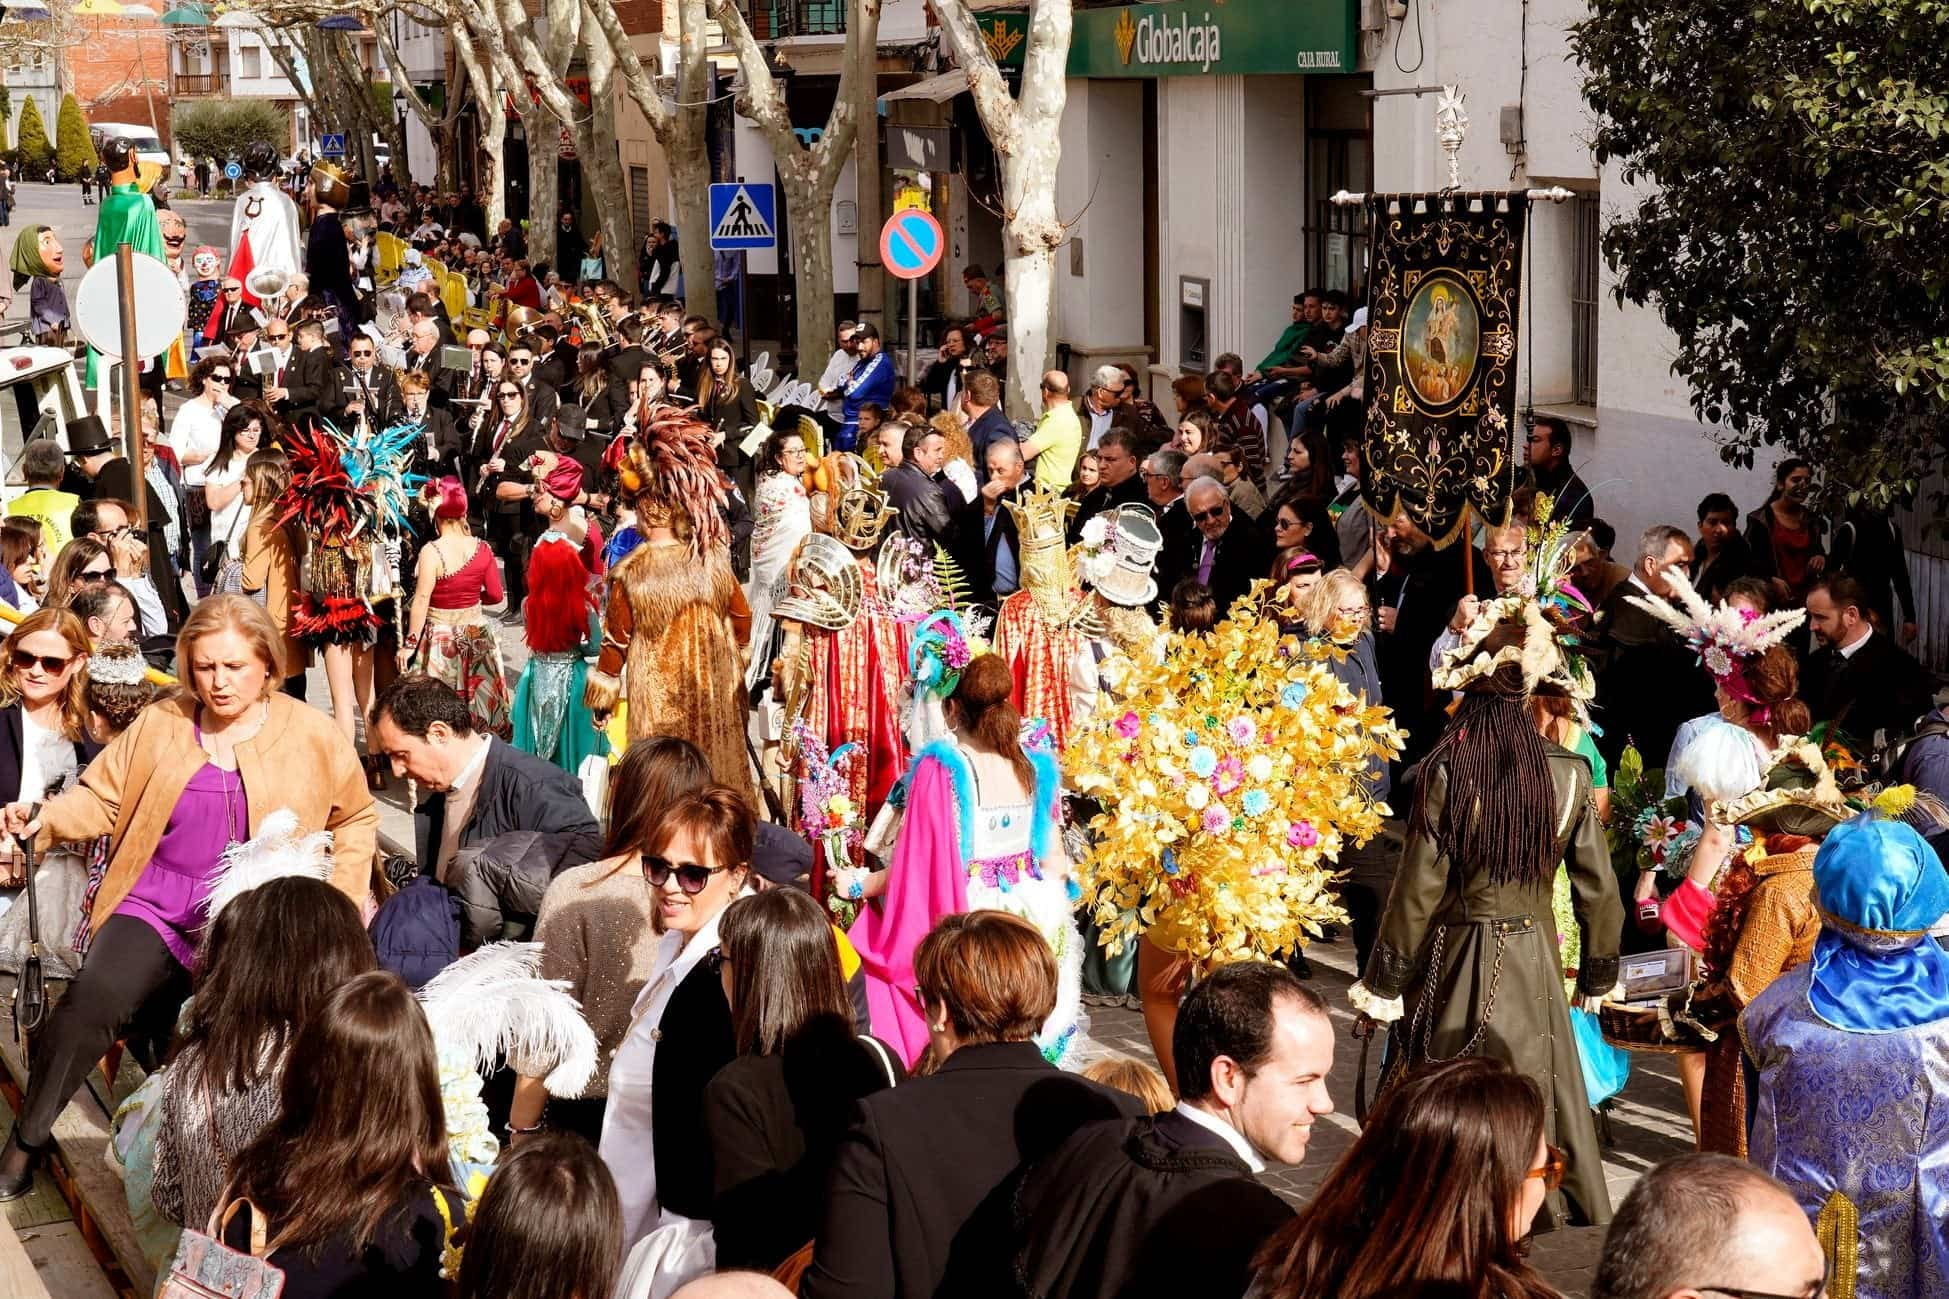 Carnaval de herencia 2020 ofertorio 92 - Selección de fotografías del Ofertorio del Carnaval de Herencia